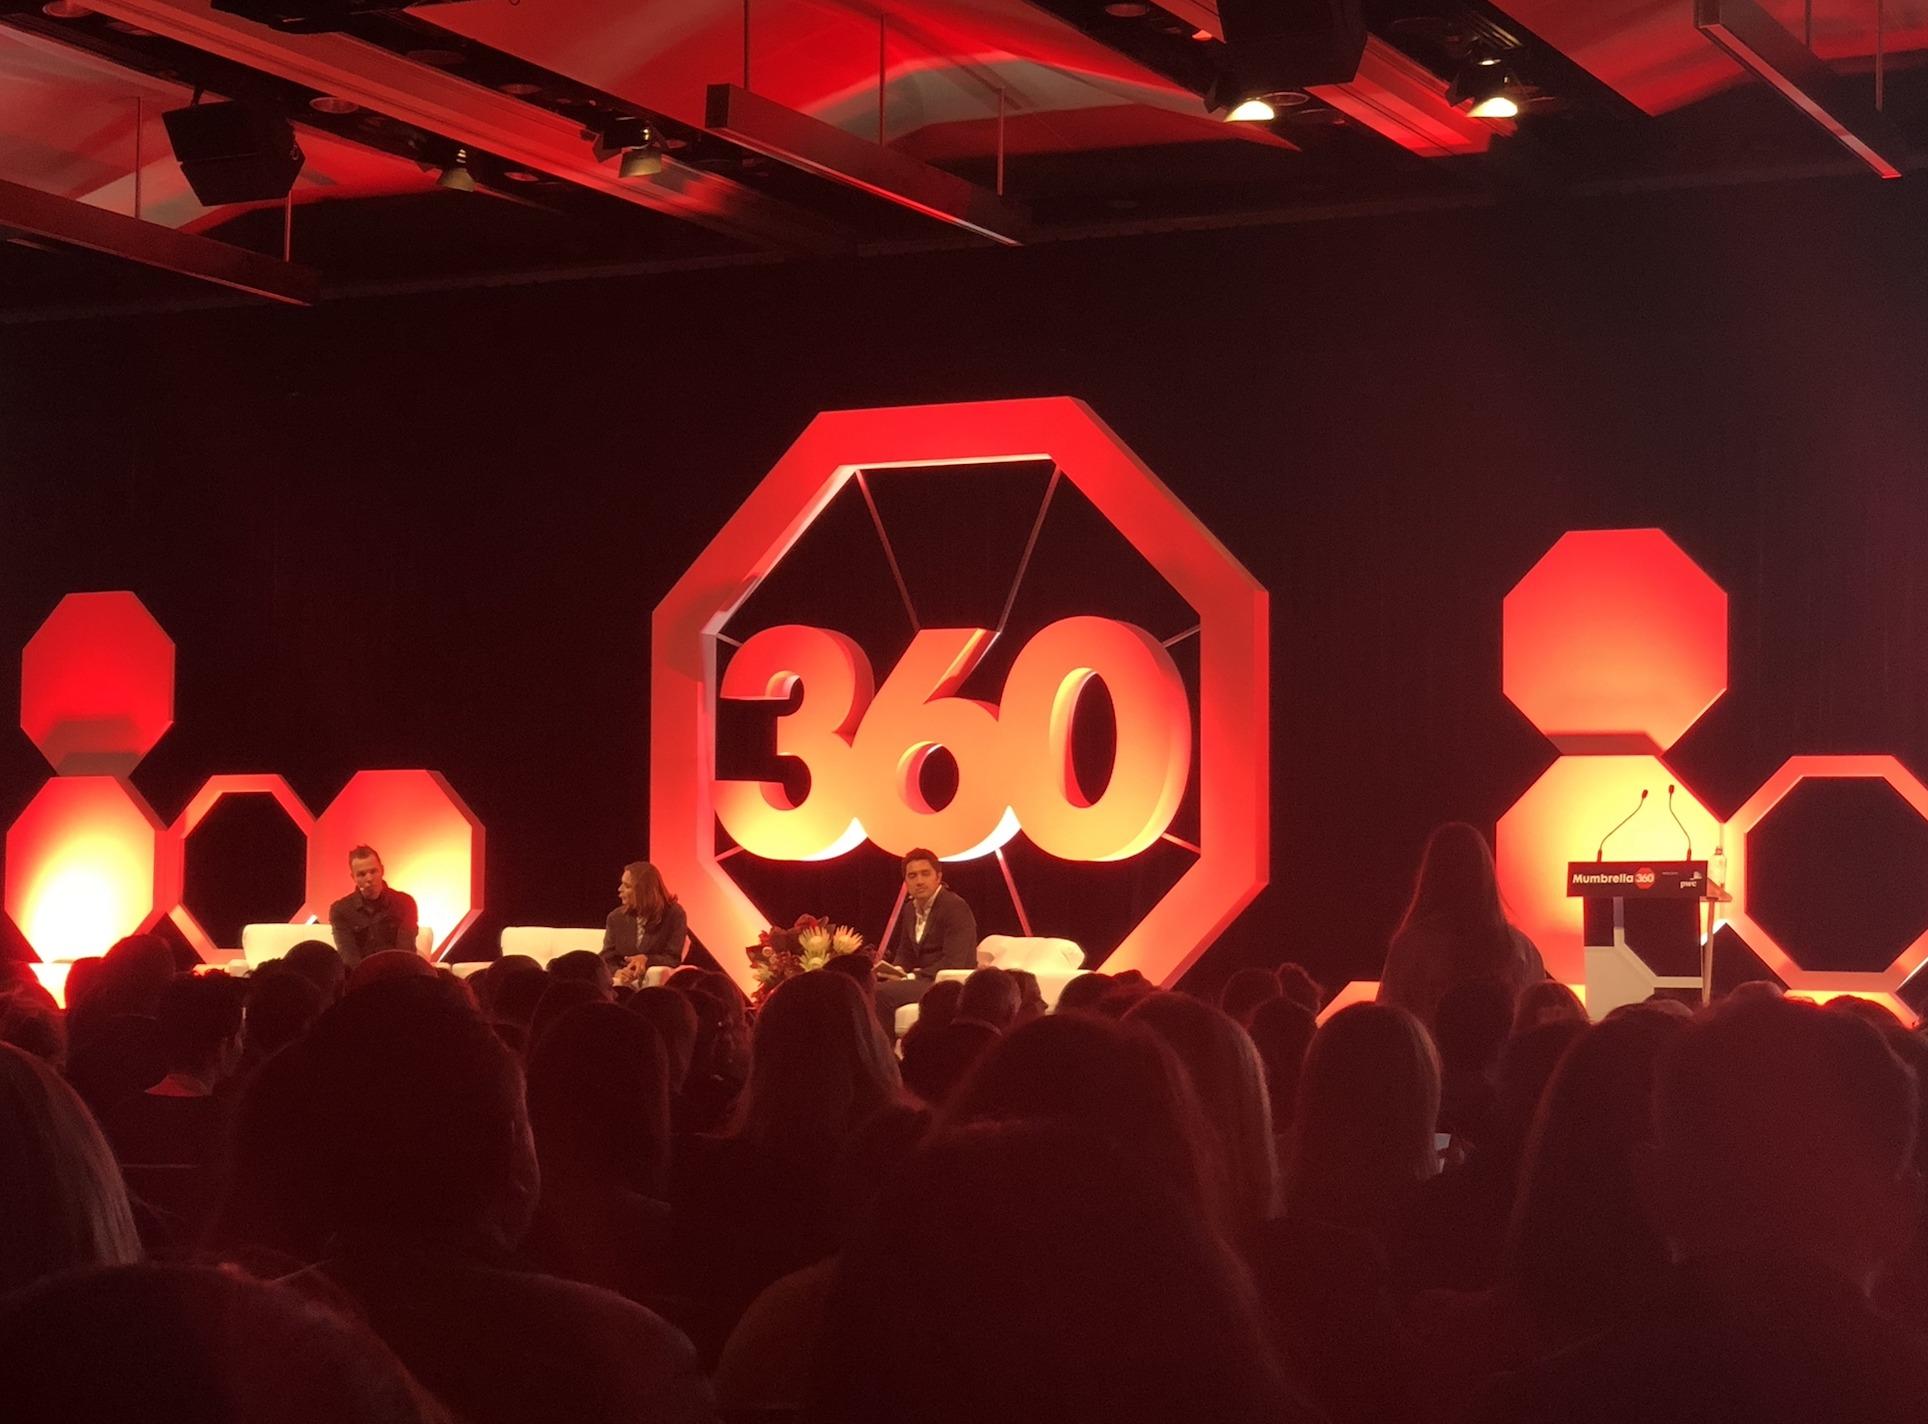 Long & Co Attends Mumbrella 360, 2018